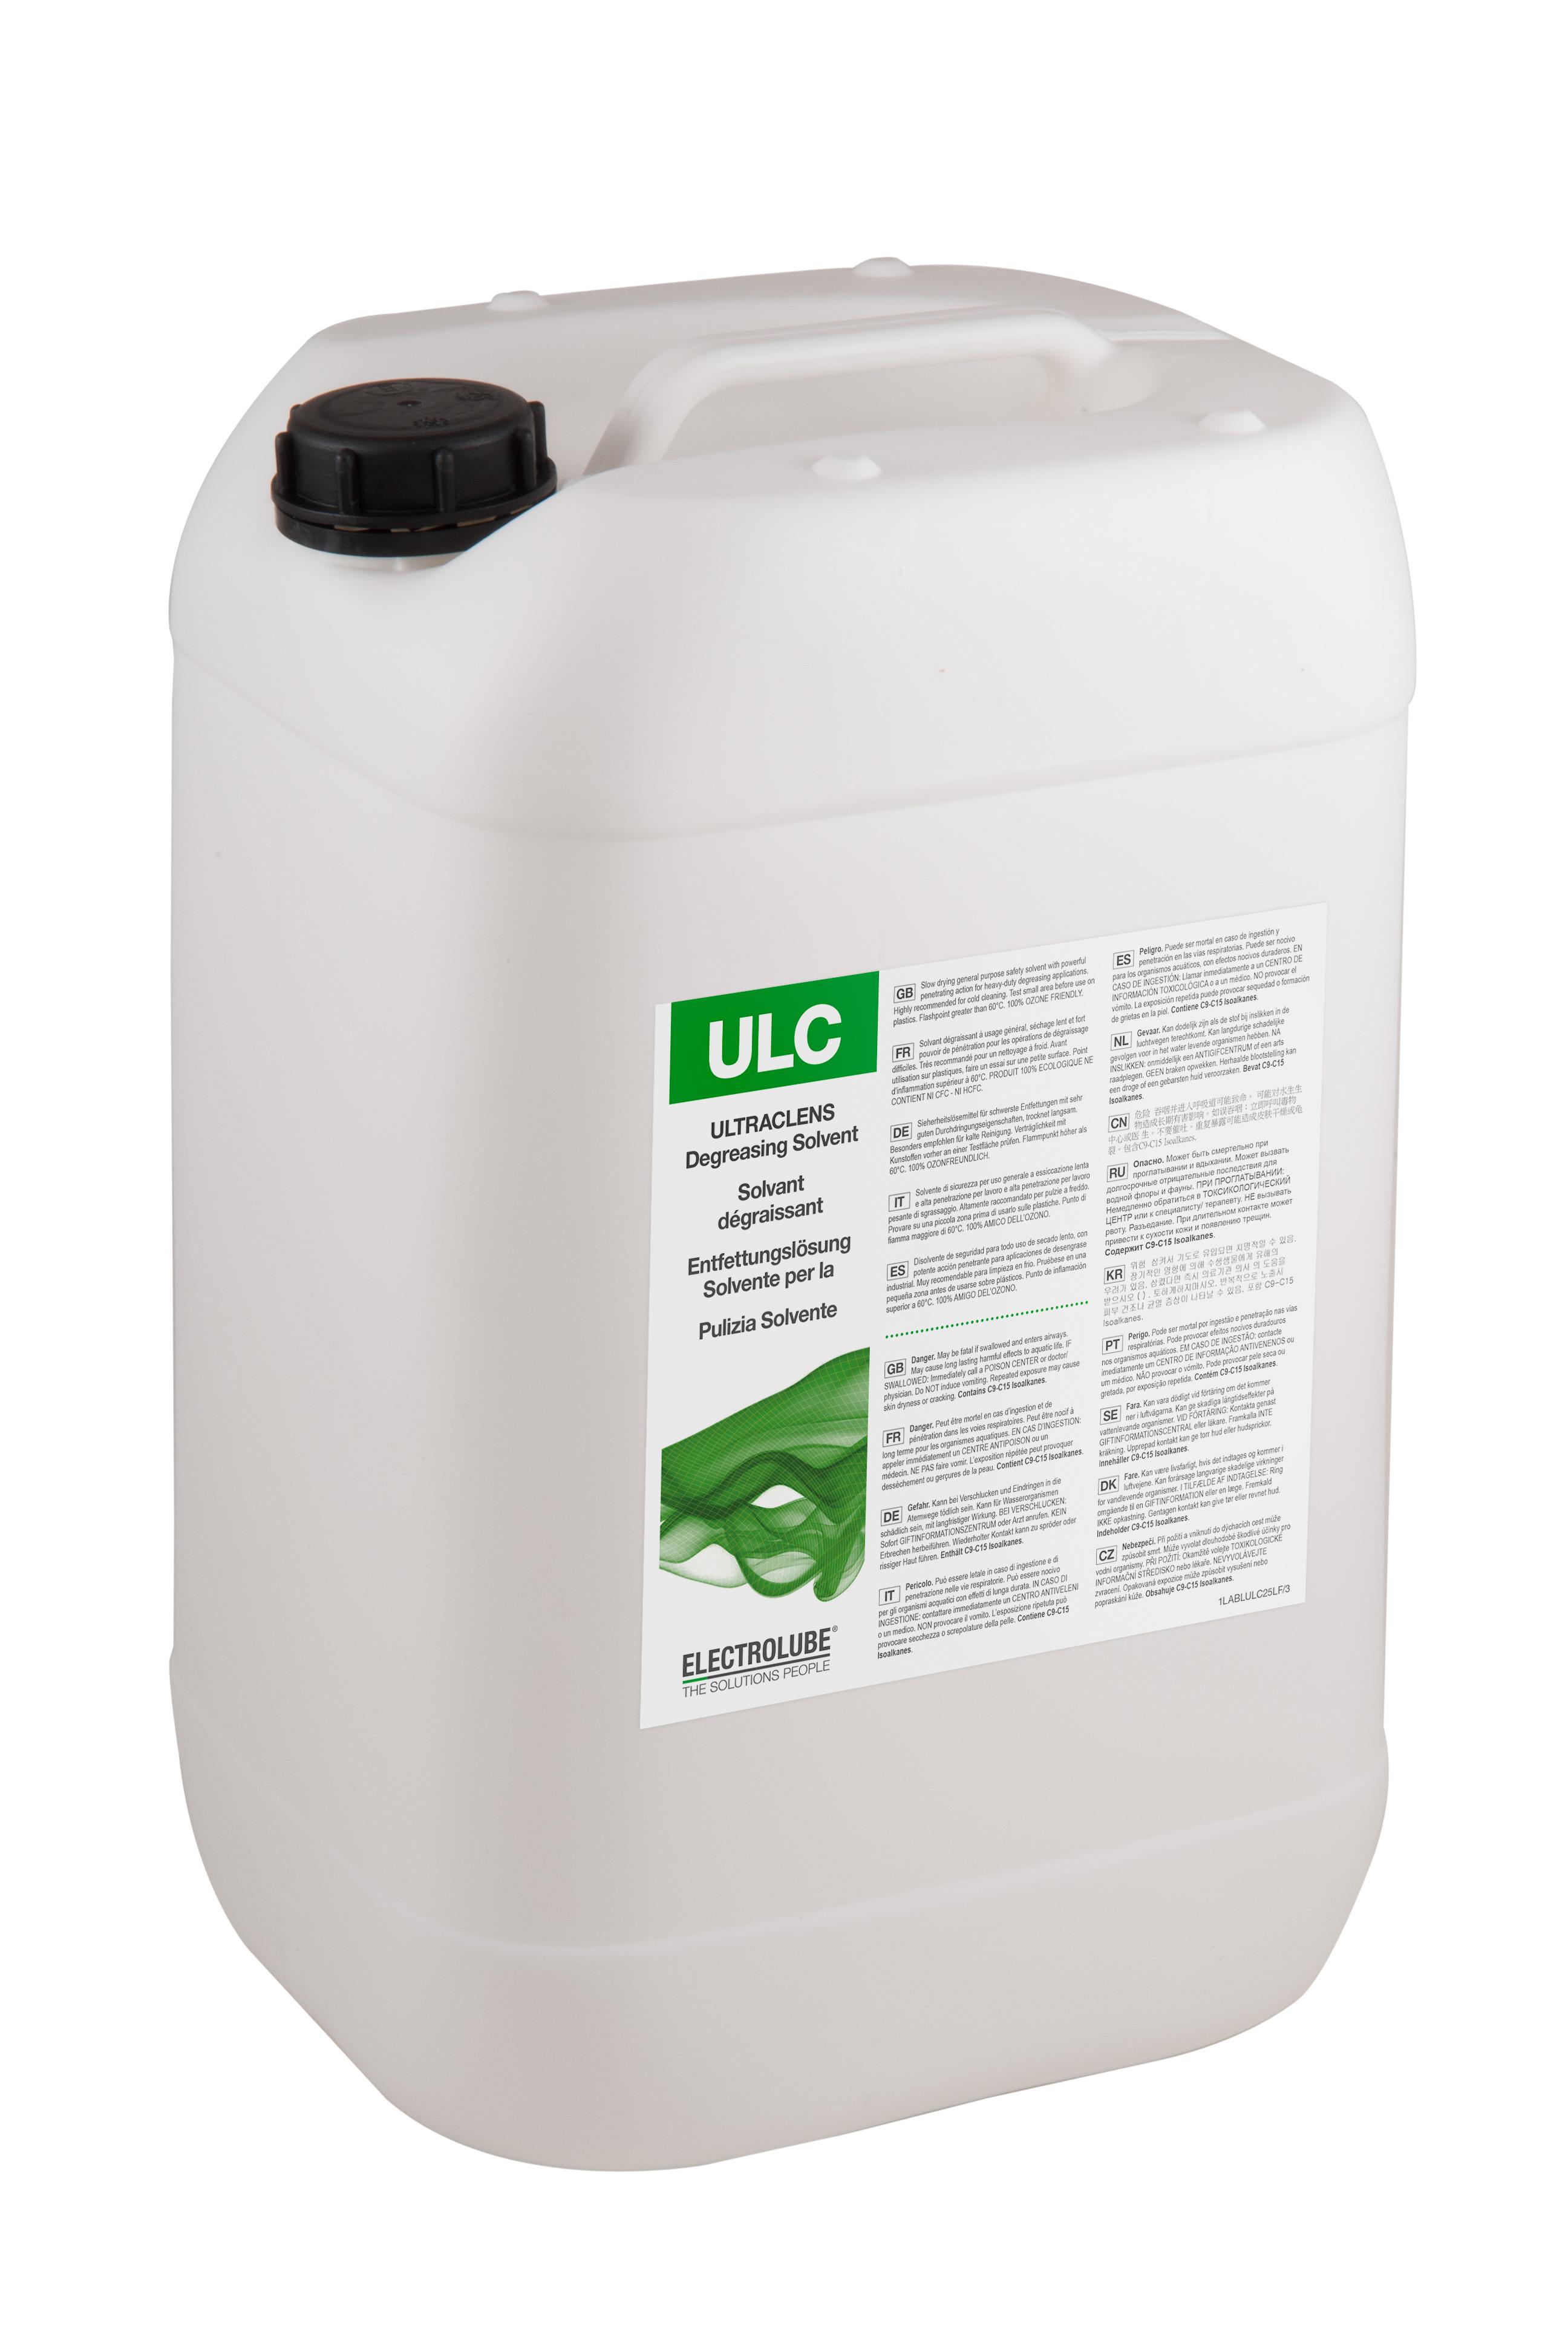 ULC25L Electrolube   ULC25L купить на Symmetron.ru, спецификации, схемы ULC25L Electrolube